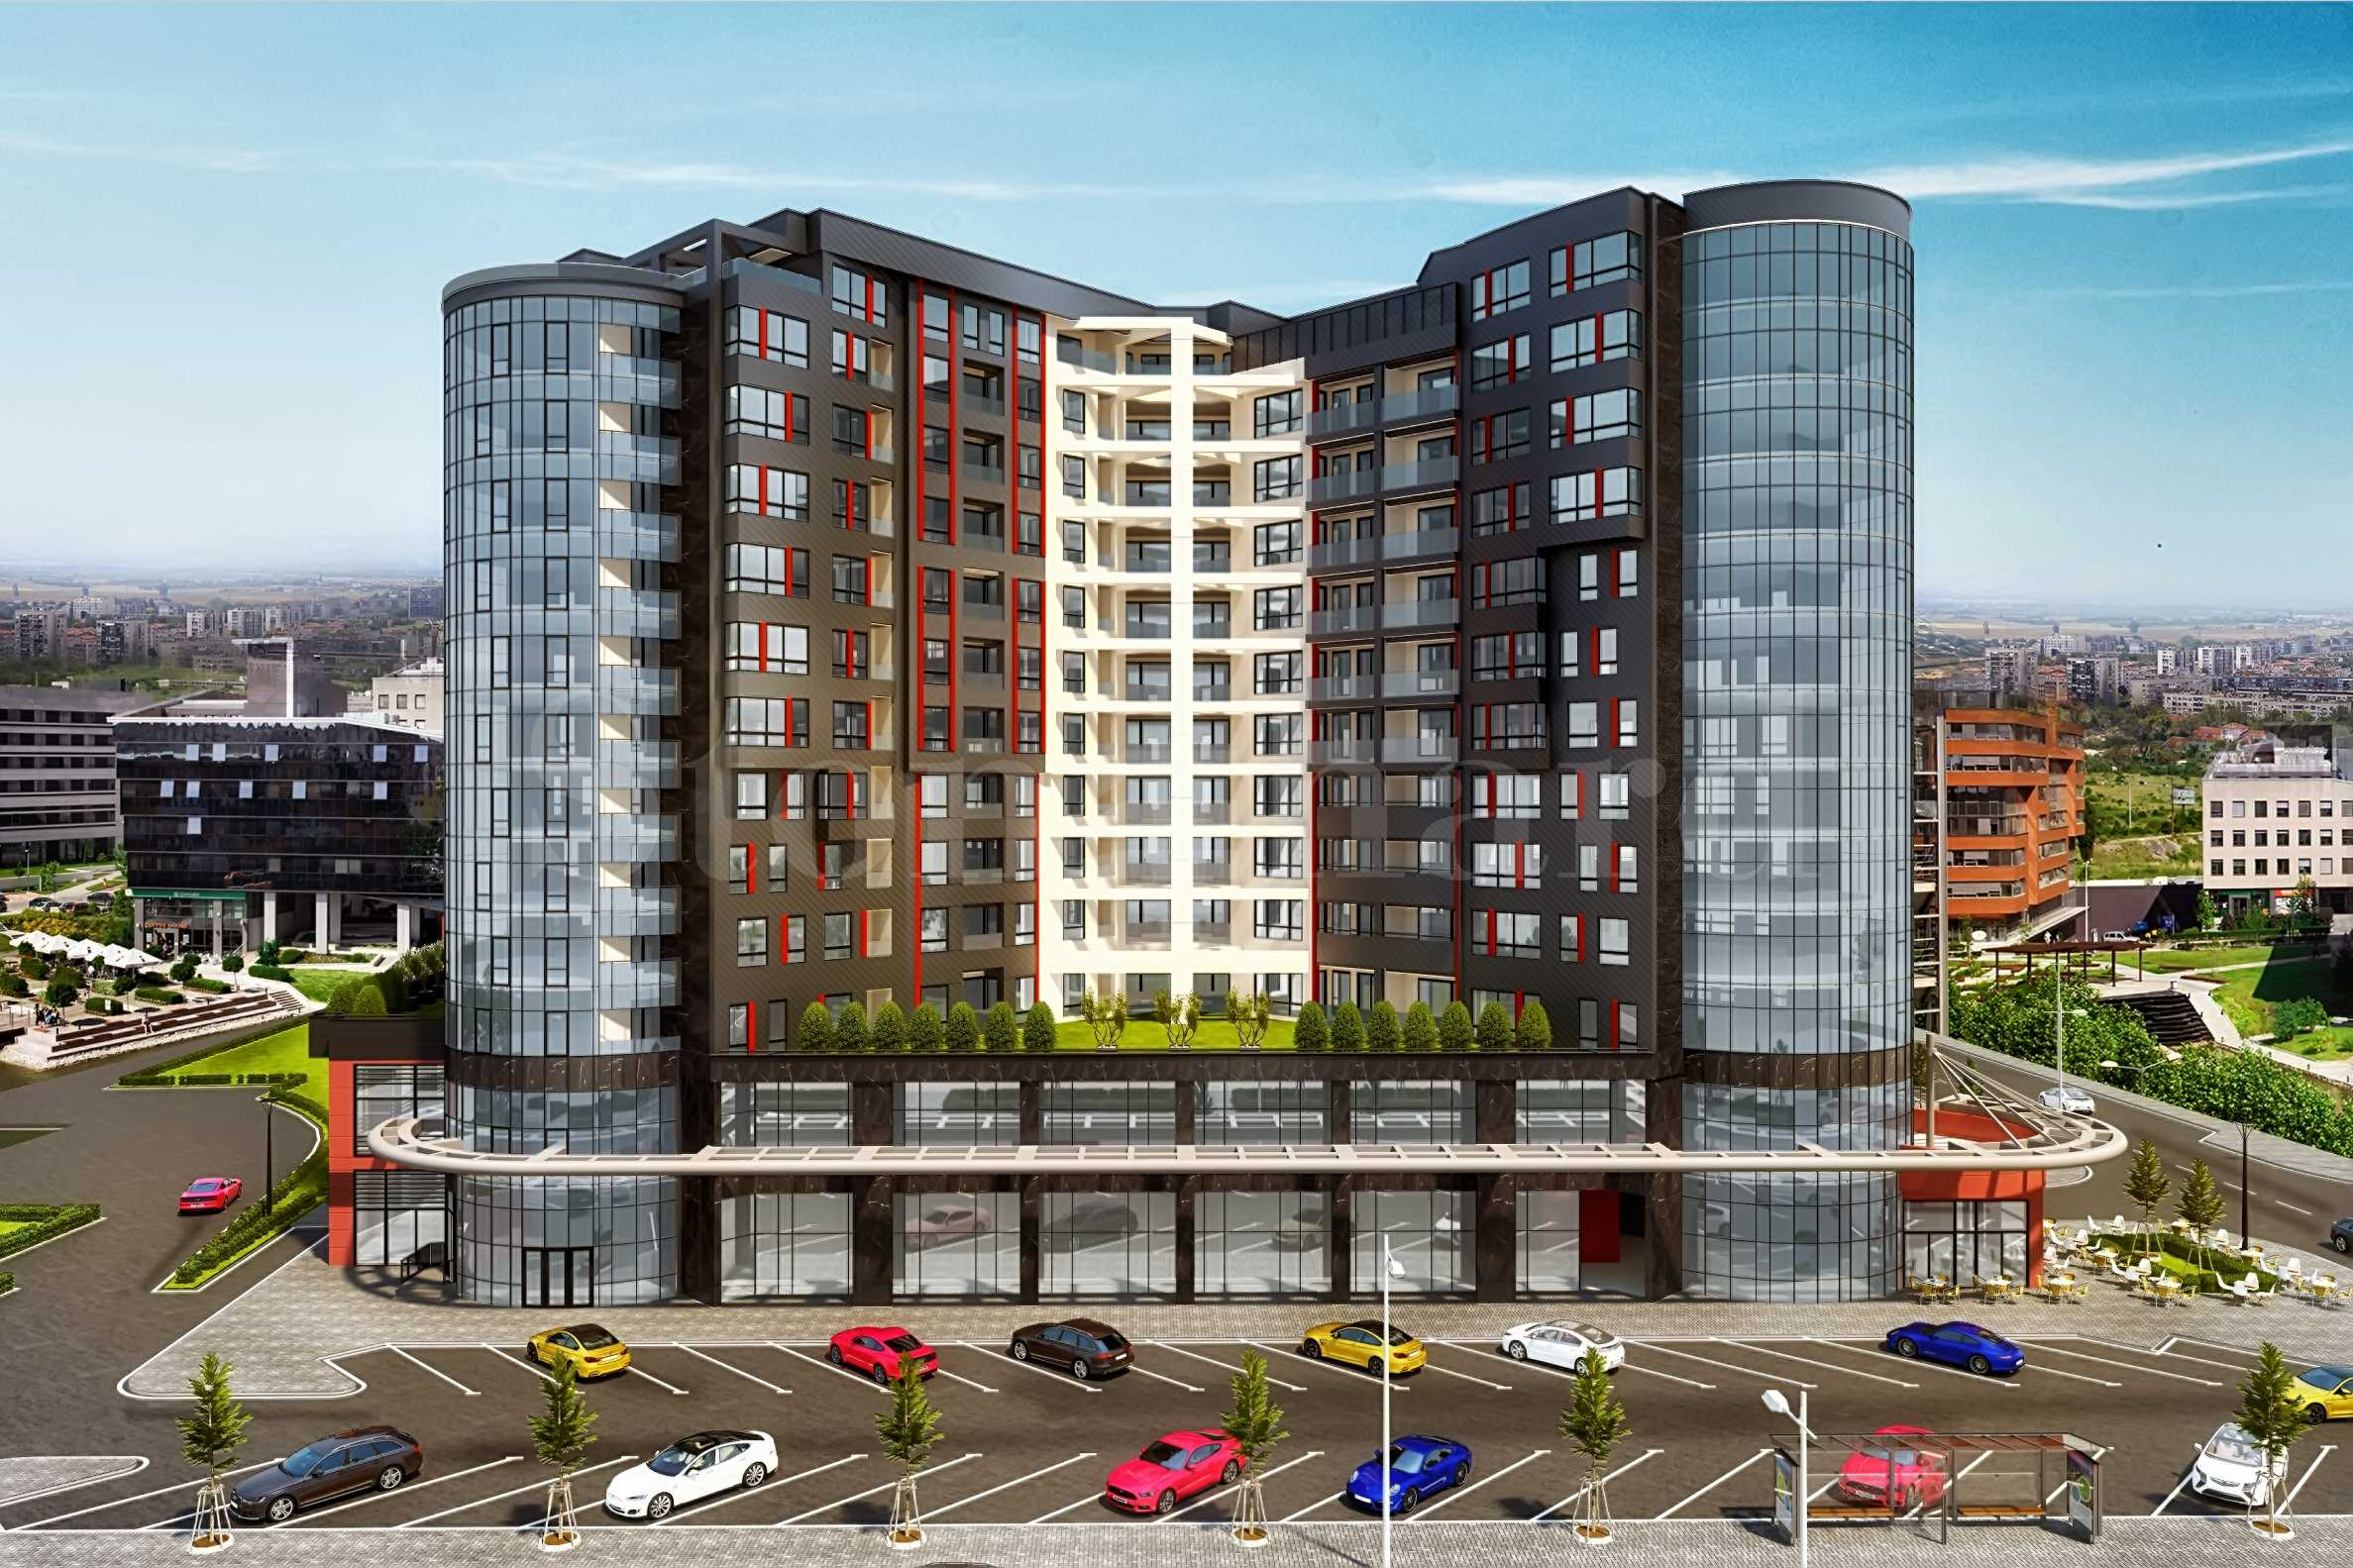 Апартаменти в нова сграда близо до мол Пловдив на промоционални цени1 - Stonehard